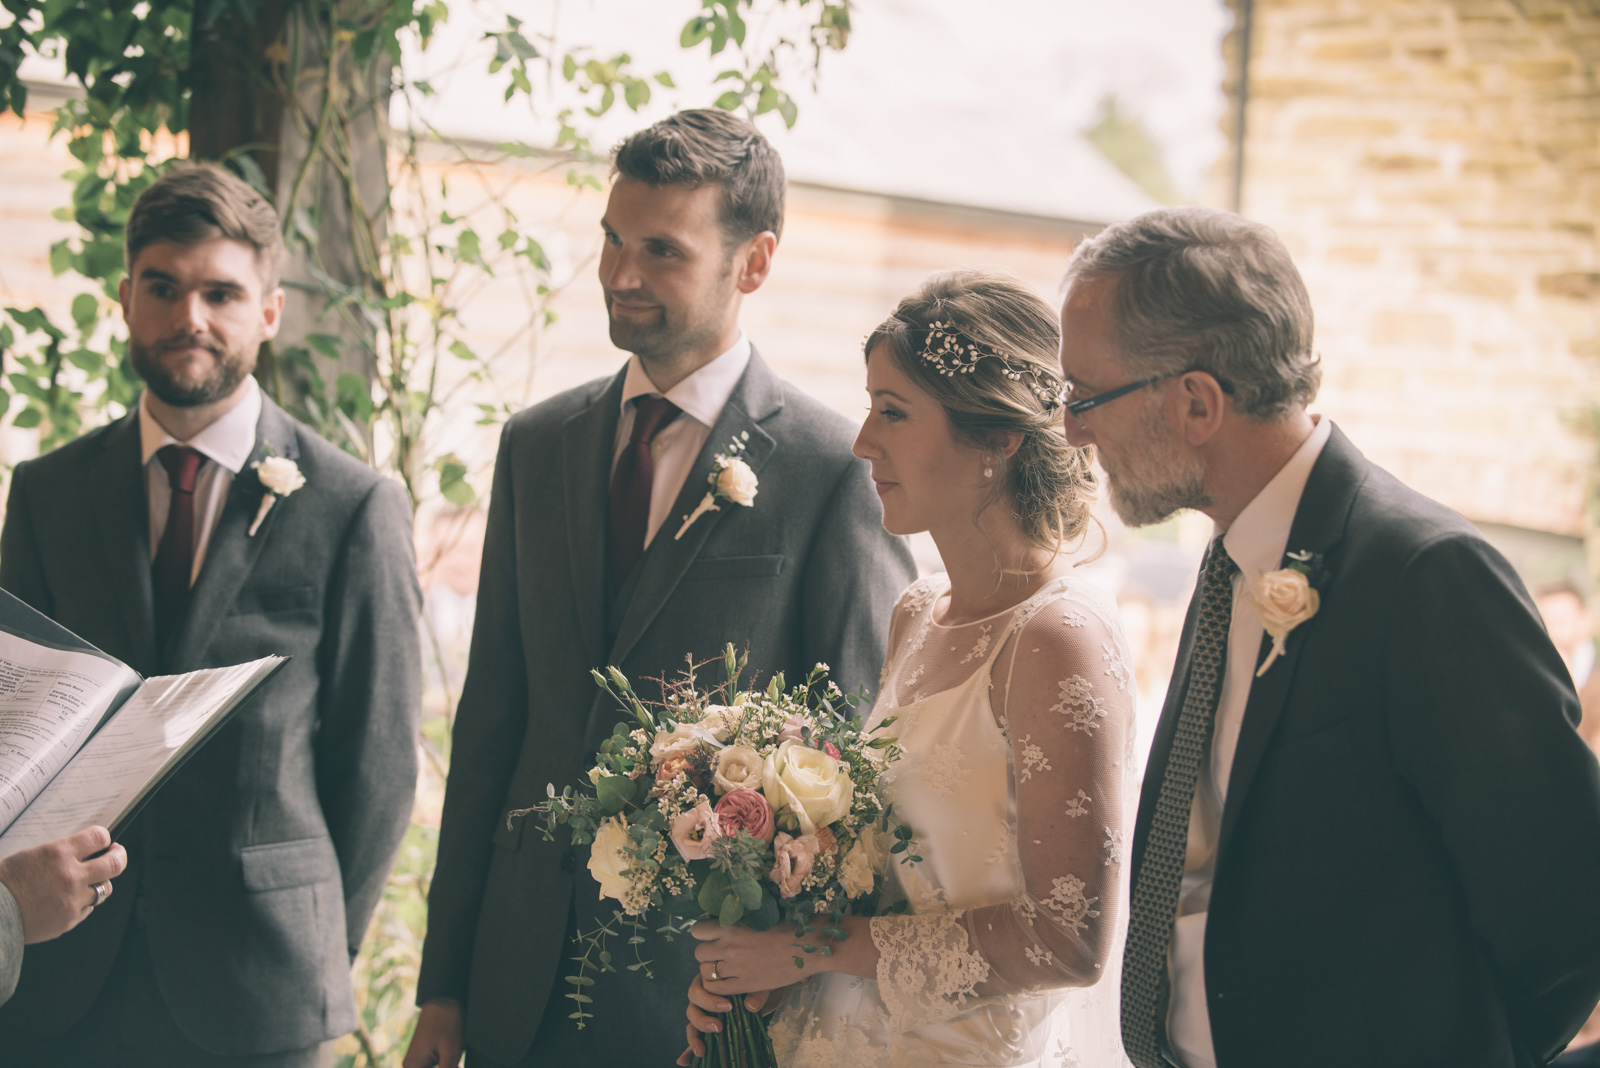 nancarrow-wedding-photography-41.jpg